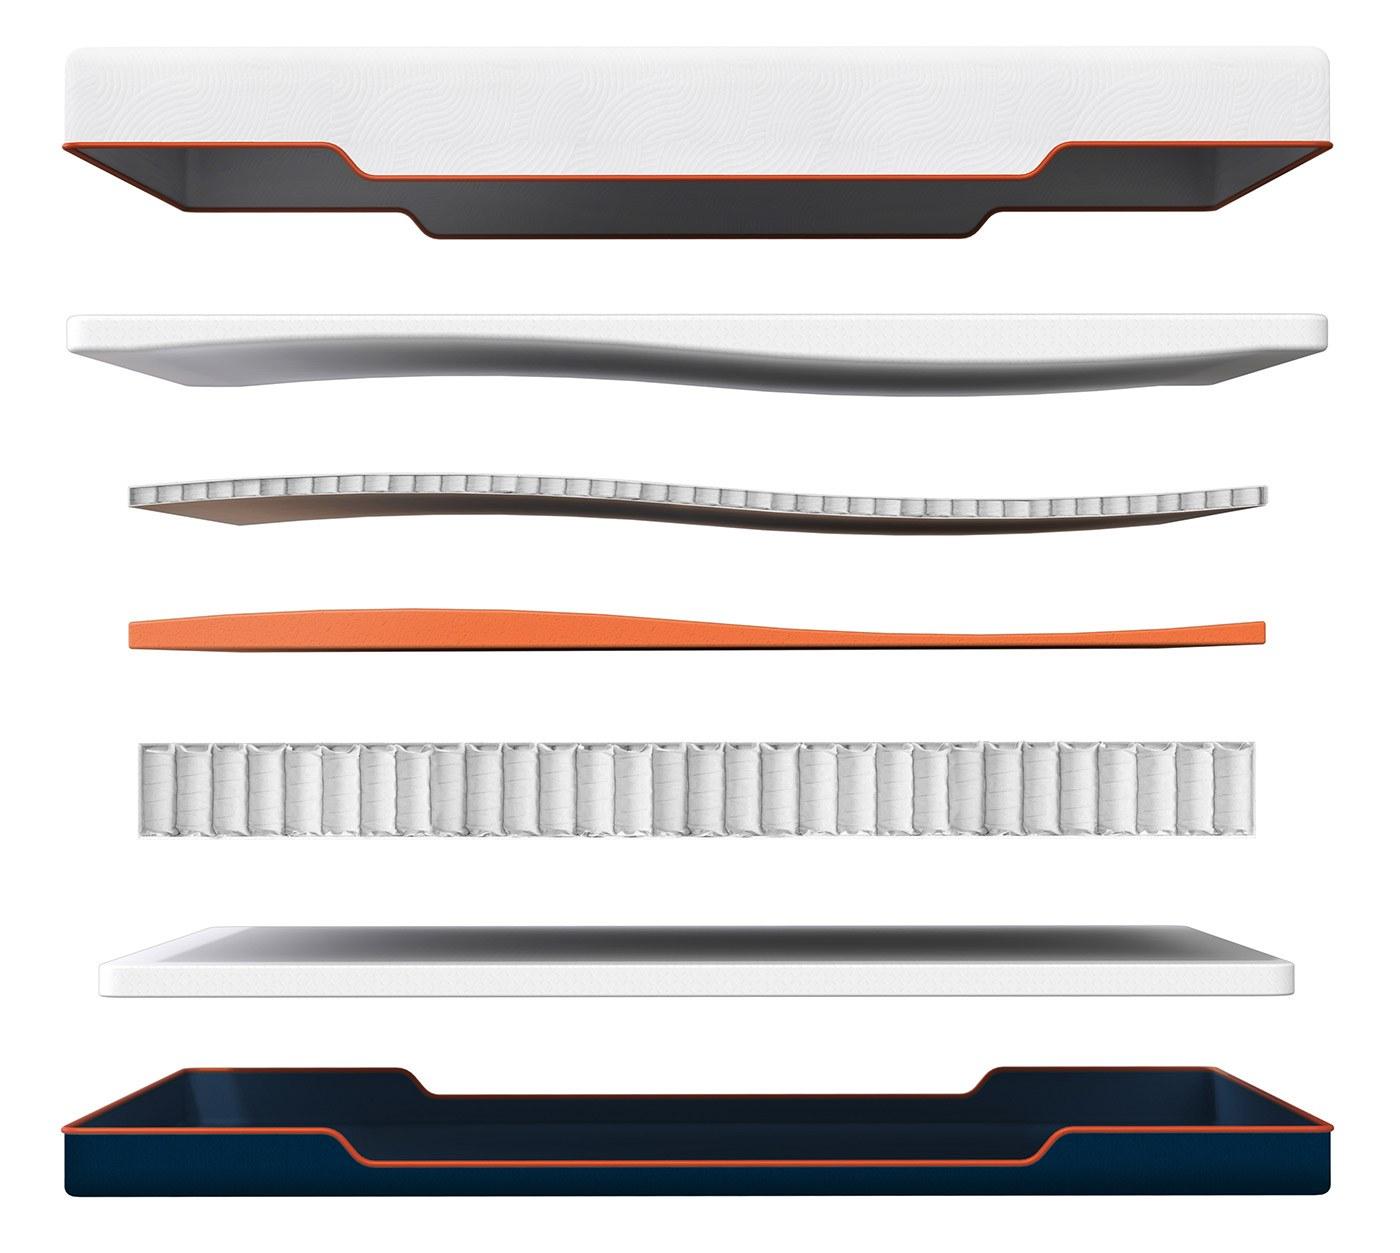 mattress-layer-diagram-mobile